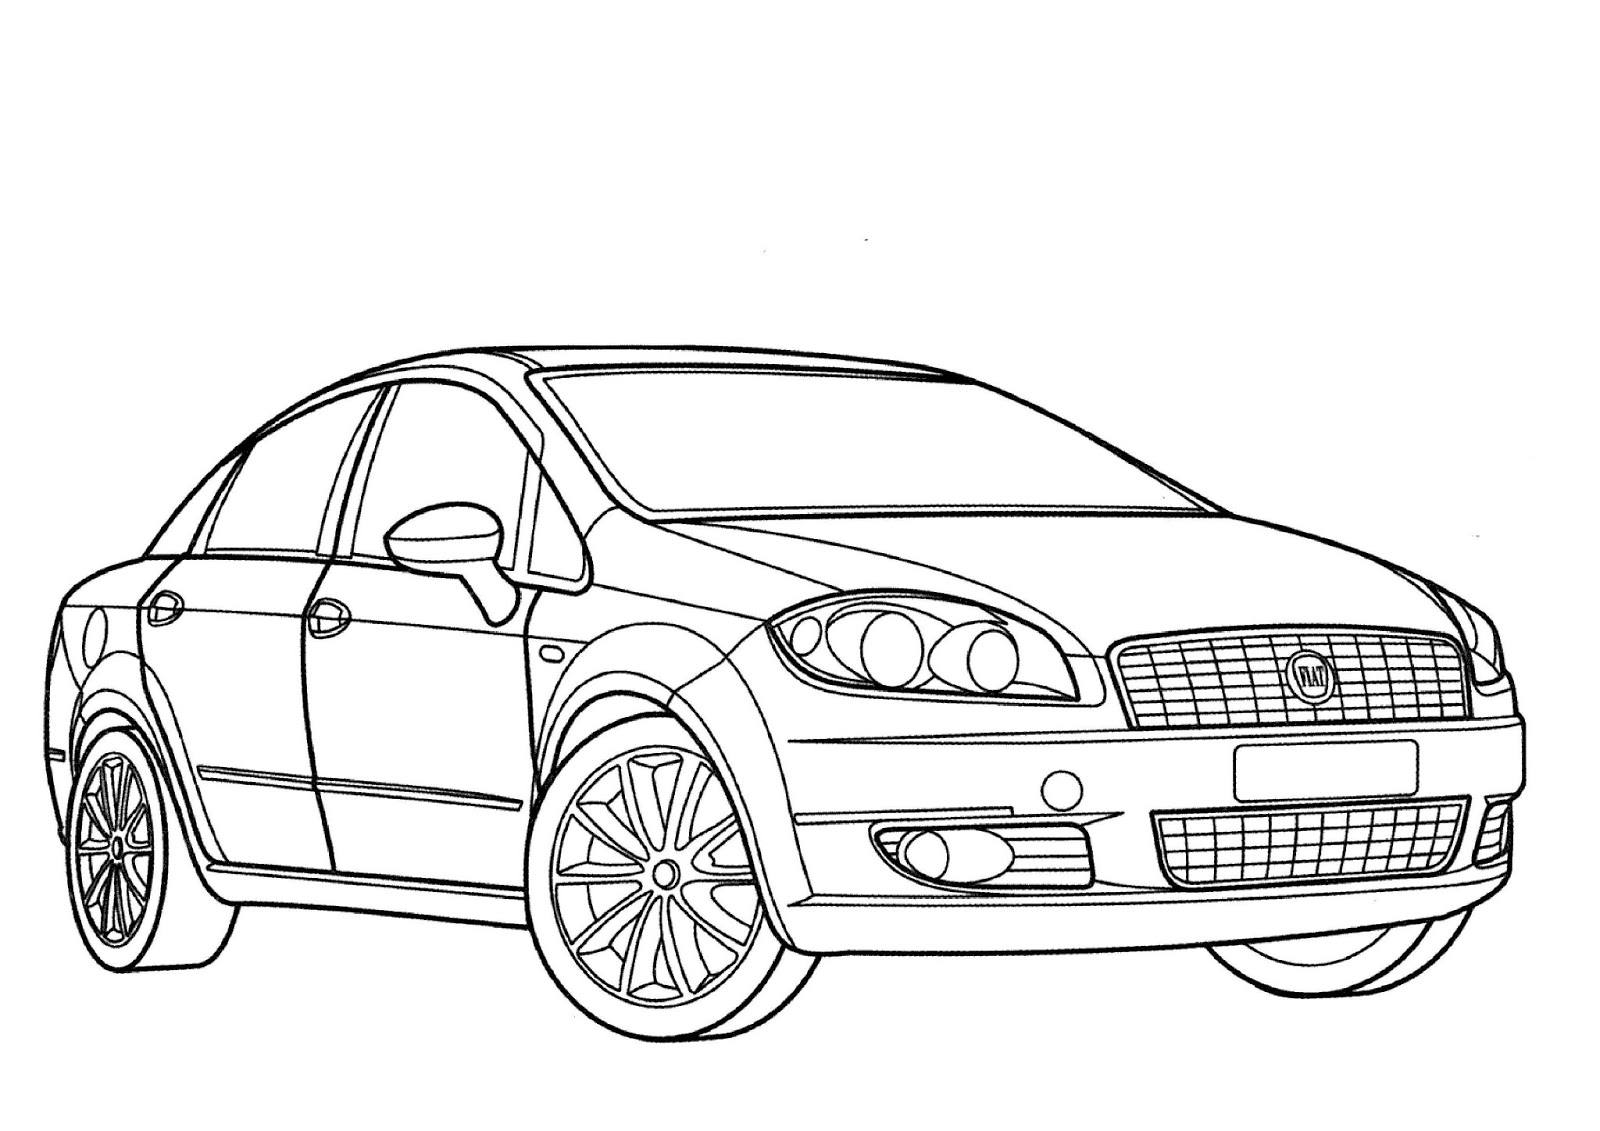 dibujos para colorear de autos nissan